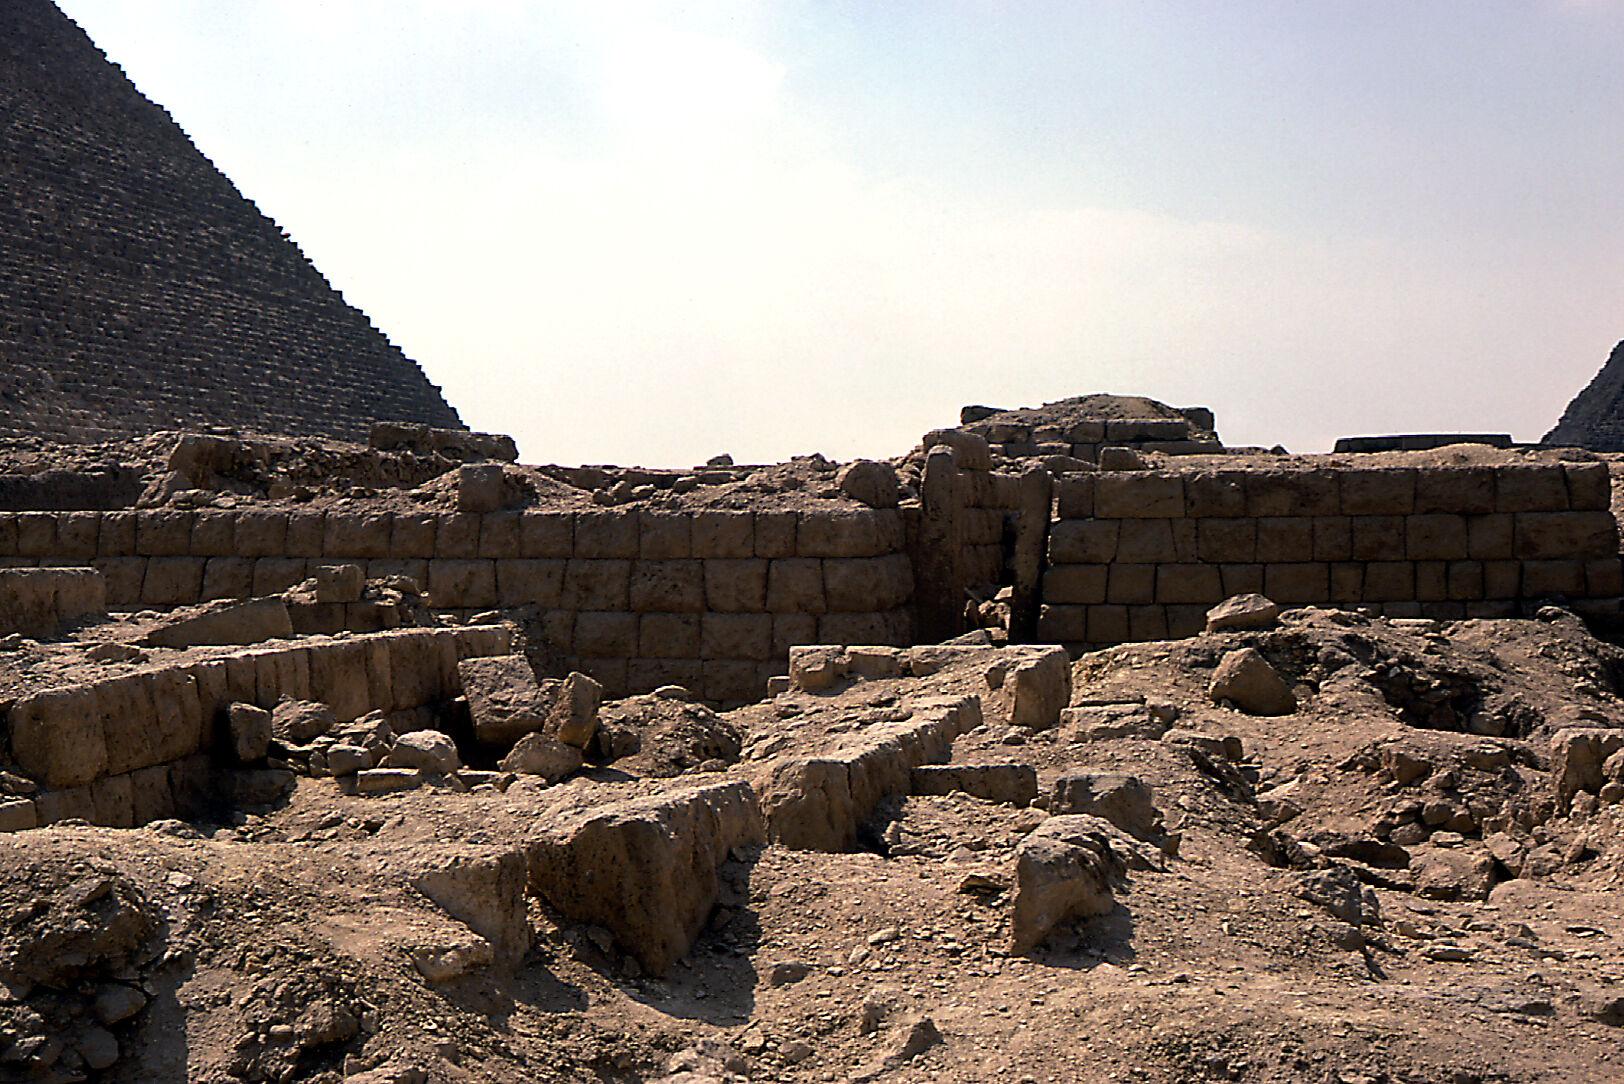 Western Cemetery: Site: Giza; View: G 2403, G 2408, G 2407, G 2360, G 2353